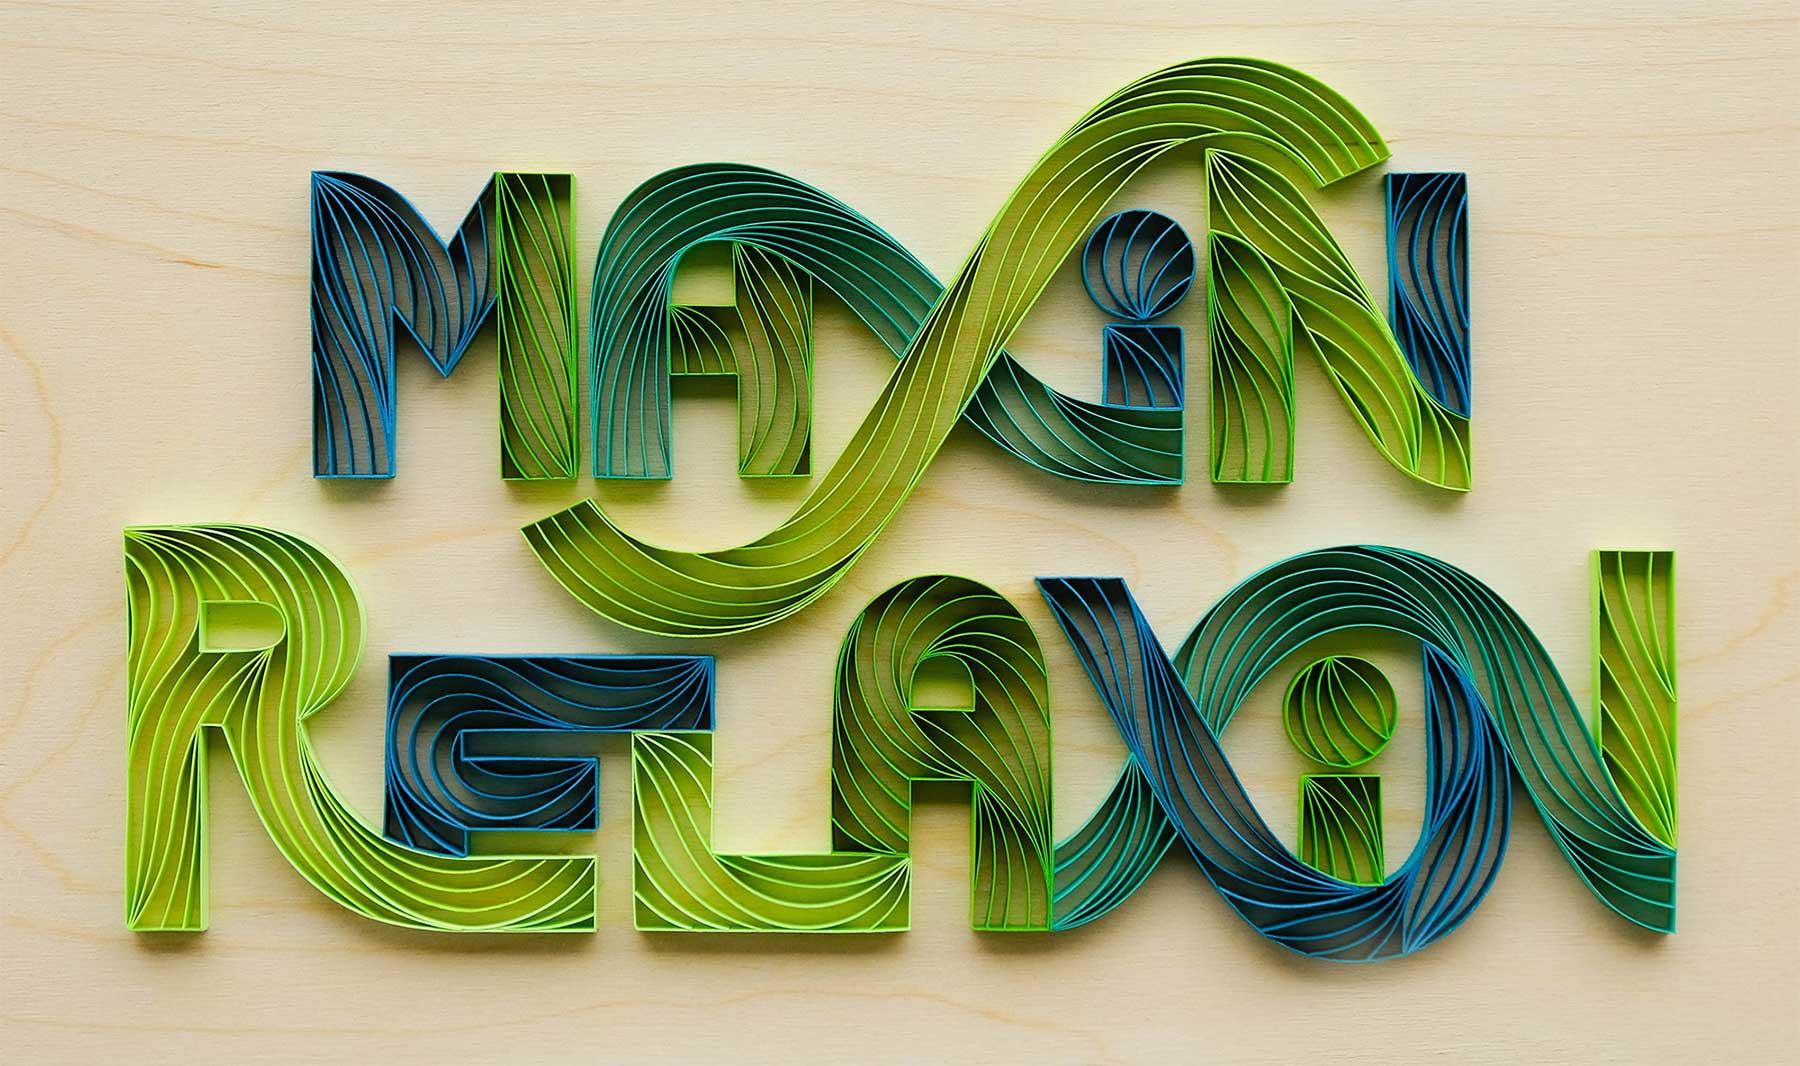 3D-Papier-Lettering von Alia Bright Alia-Bright-paperlettering_05